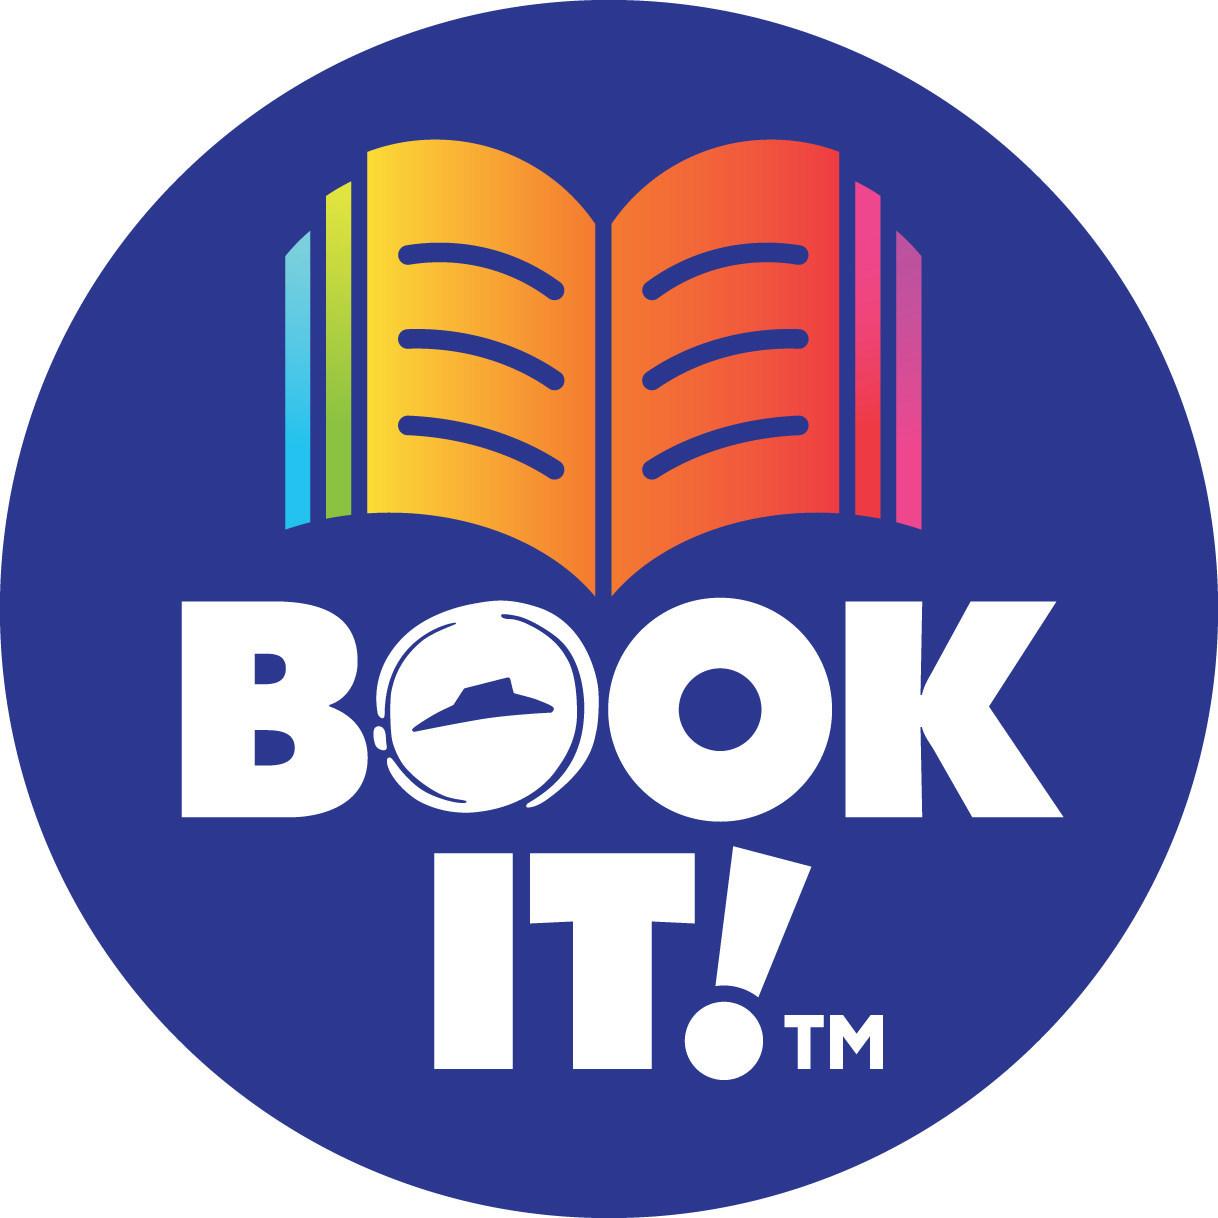 Pizza Hut Book It Program Announces New Author Partner Tom